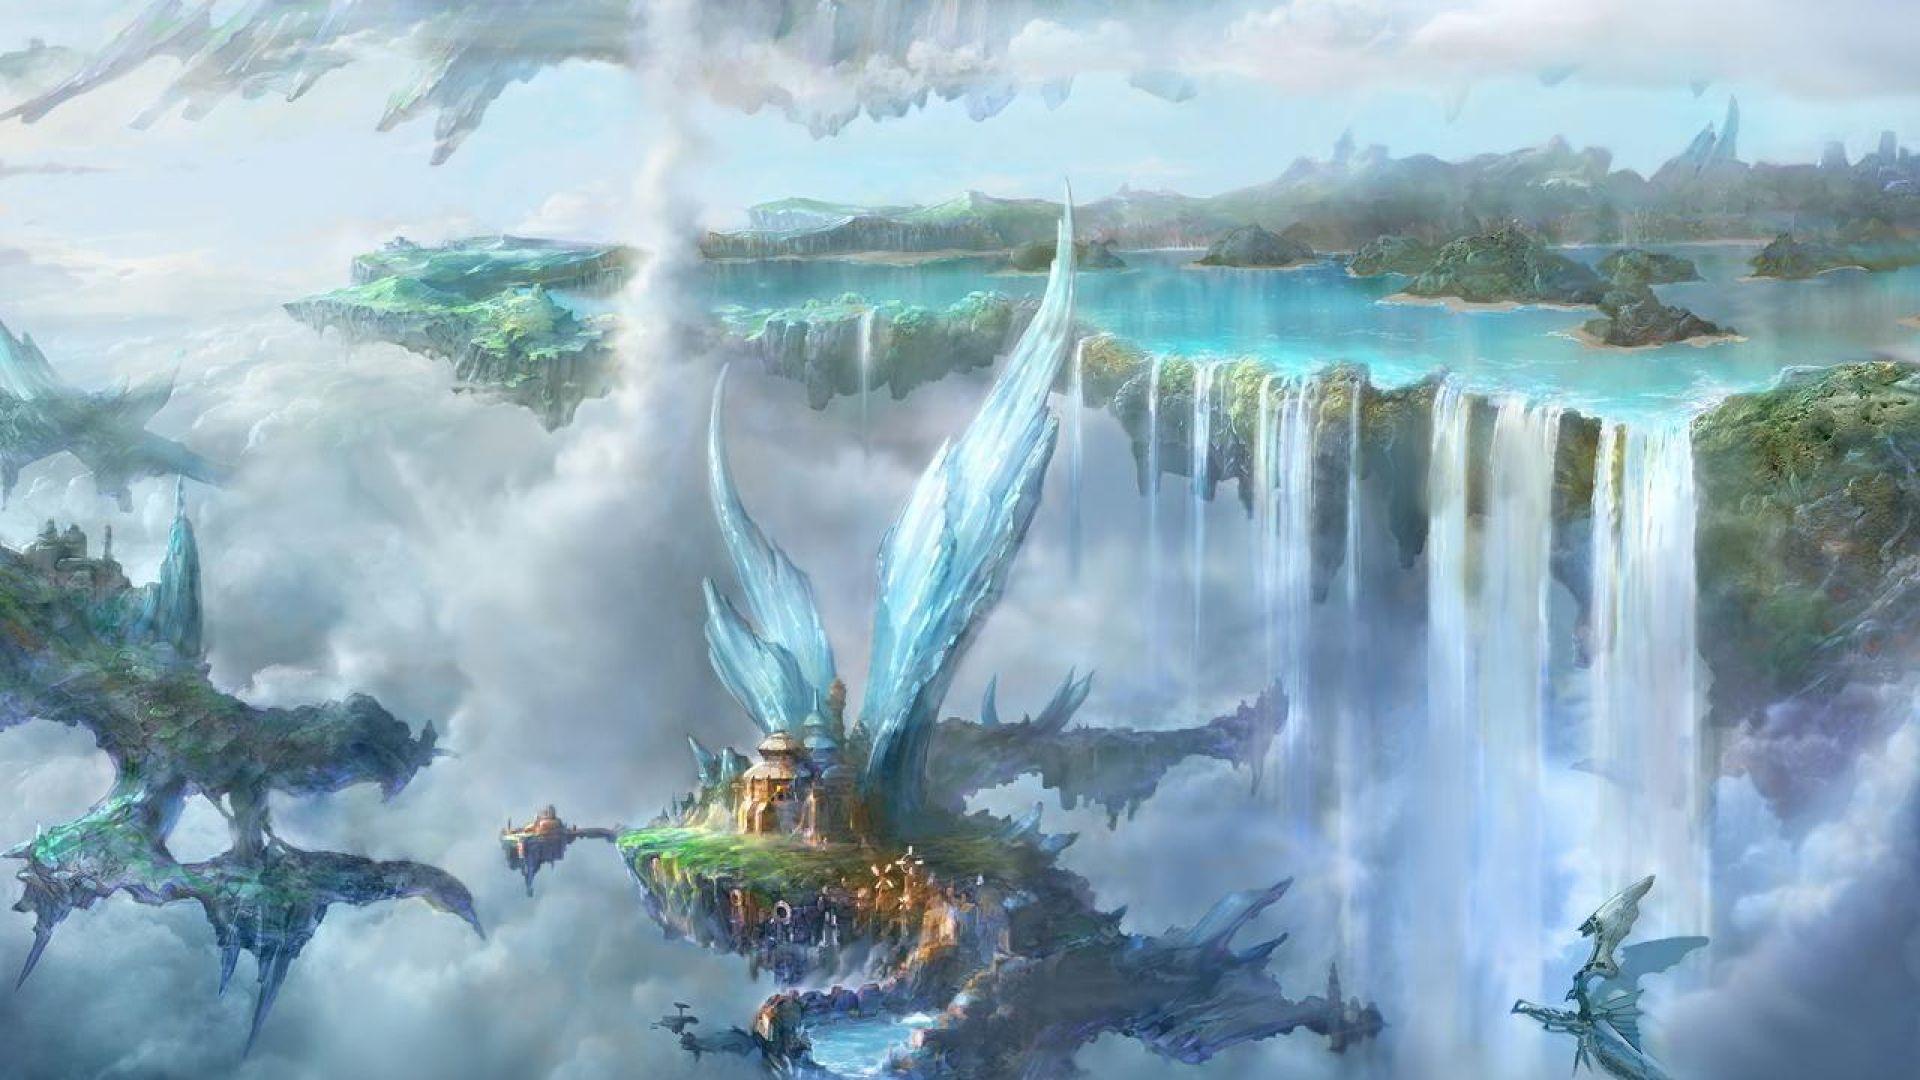 fonds d'écran final fantasy : tous les wallpapers final fantasy